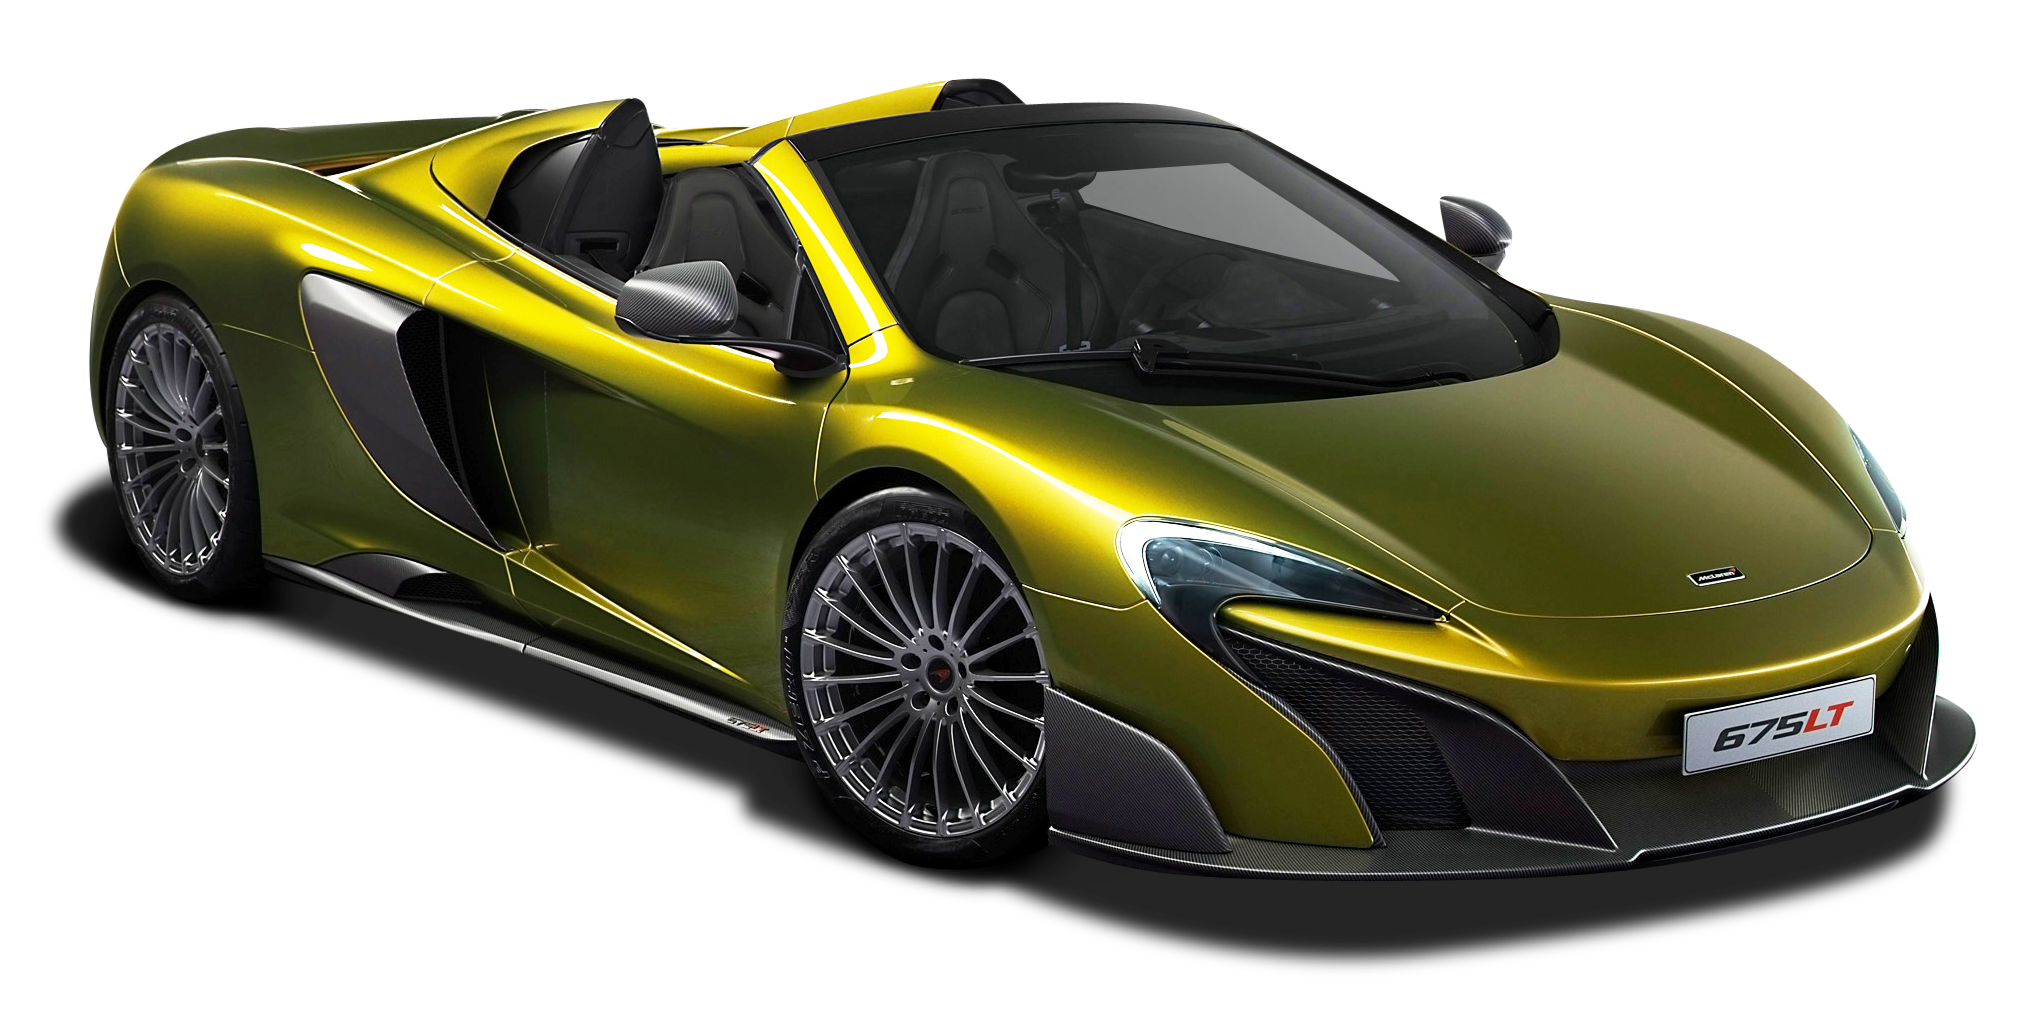 Download Green Mclaren 675lt Spider Super Car Png Image For Free Super Cars Mclaren 675lt Mclaren